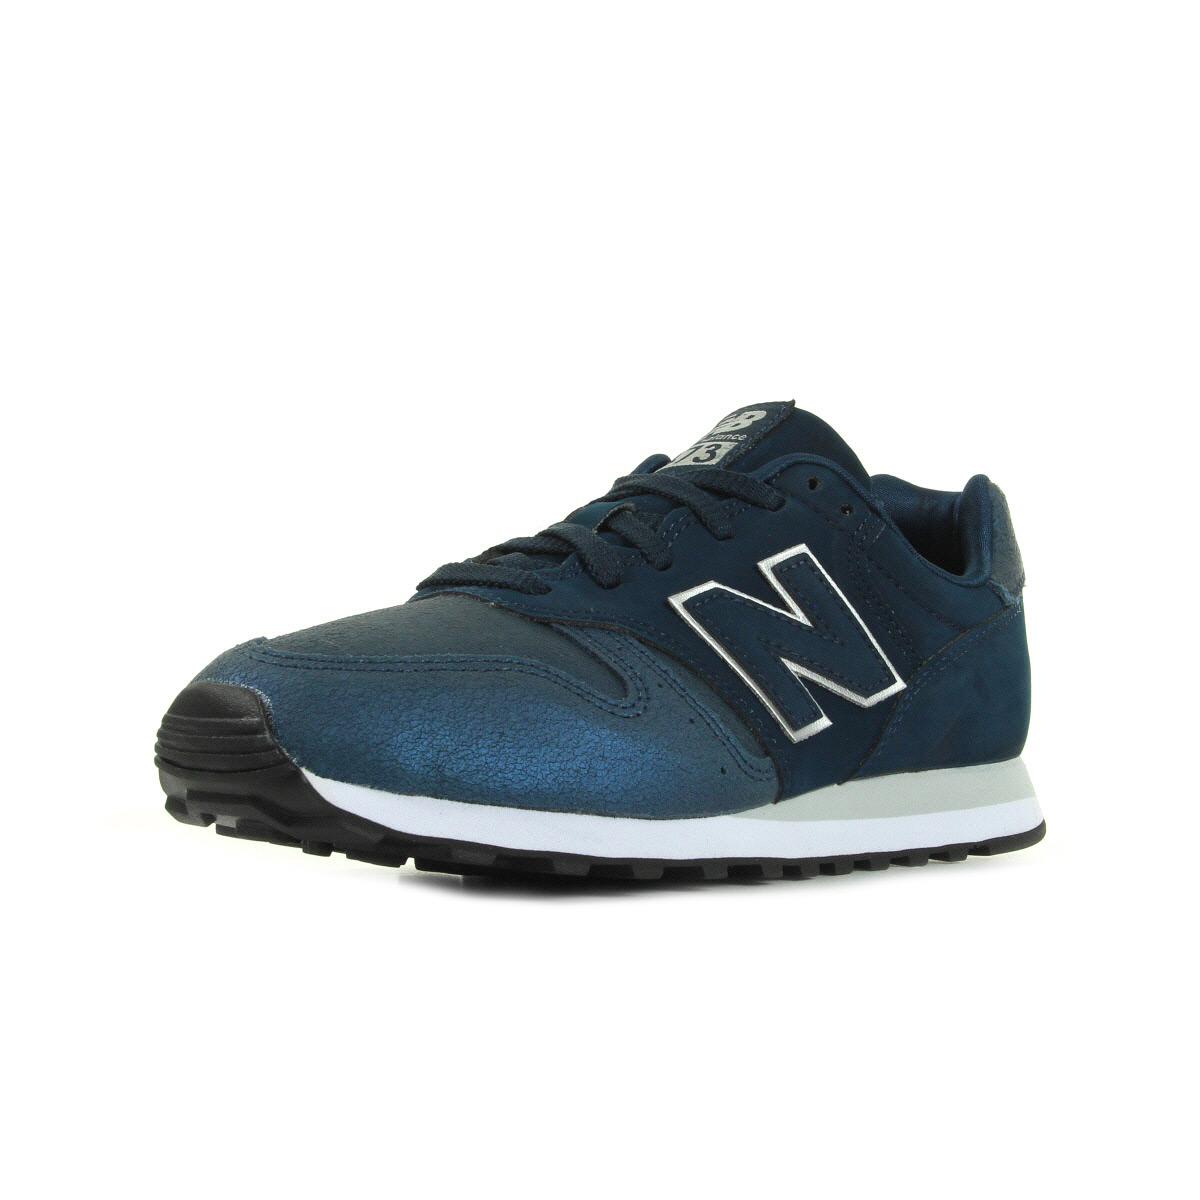 new balance wl373 wl373ns chaussures homme homme. Black Bedroom Furniture Sets. Home Design Ideas